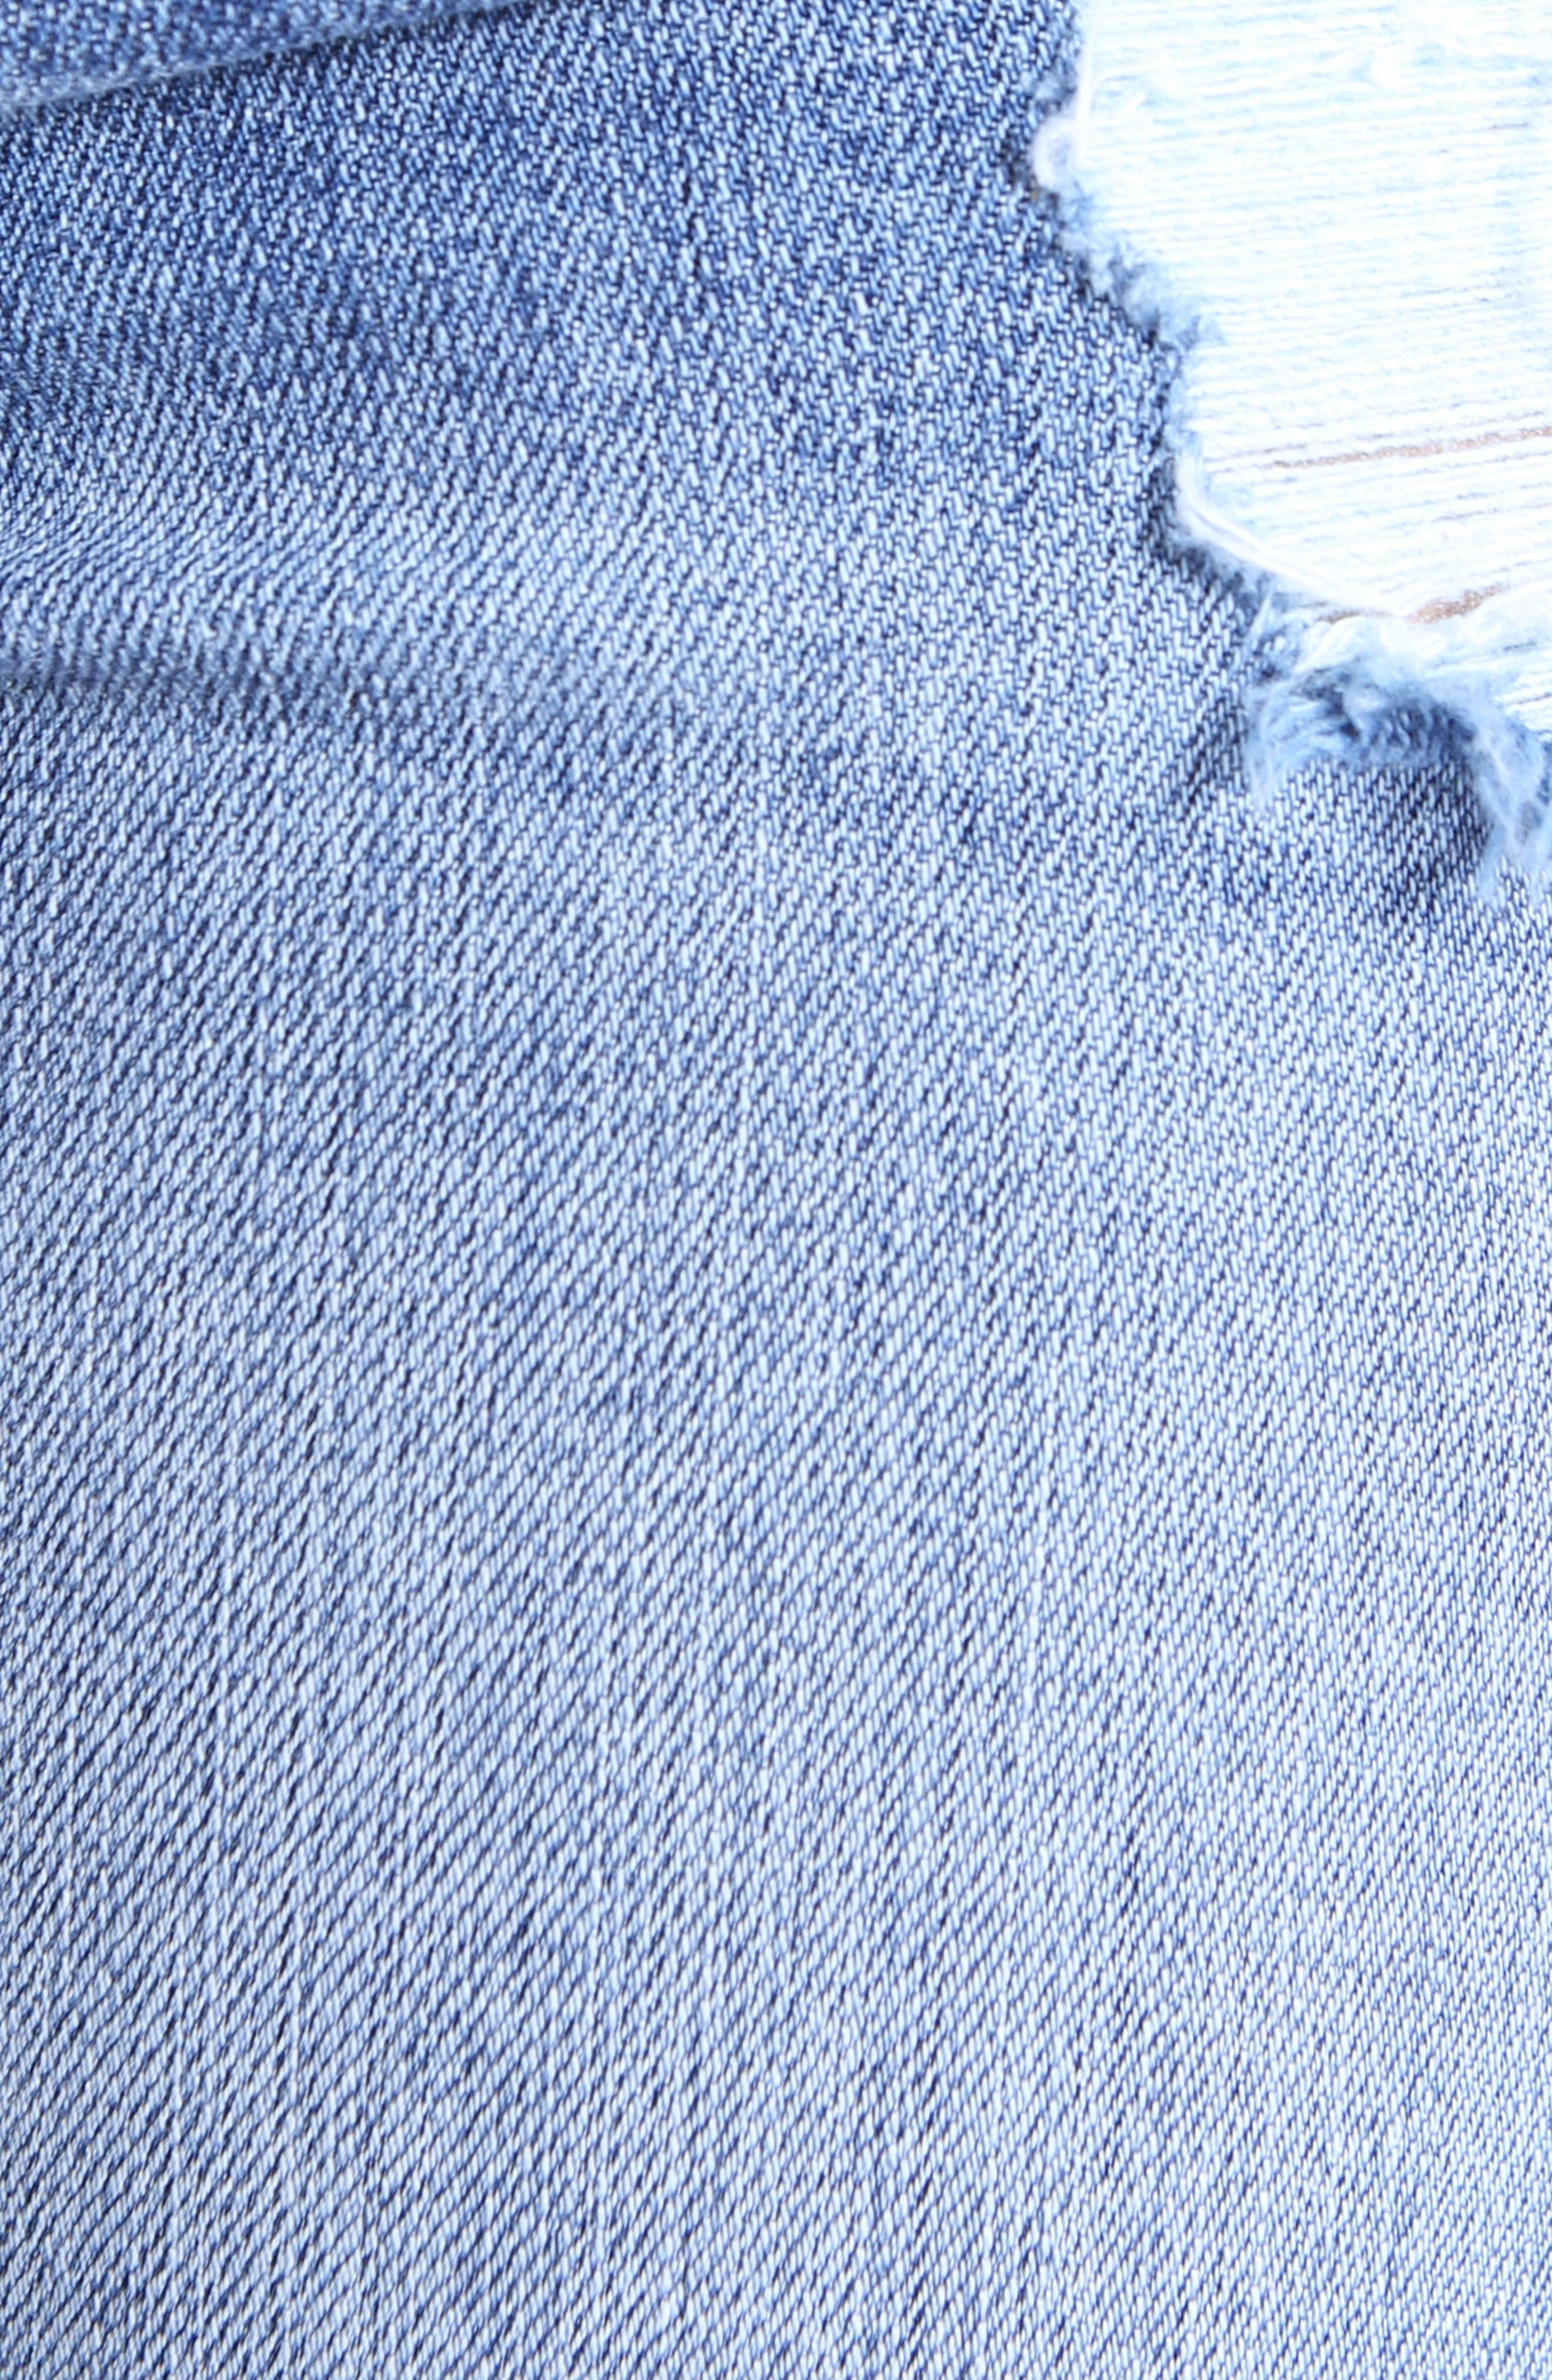 Catherine Ripped Denim Boyfriend Shorts,                             Alternate thumbnail 6, color,                             438